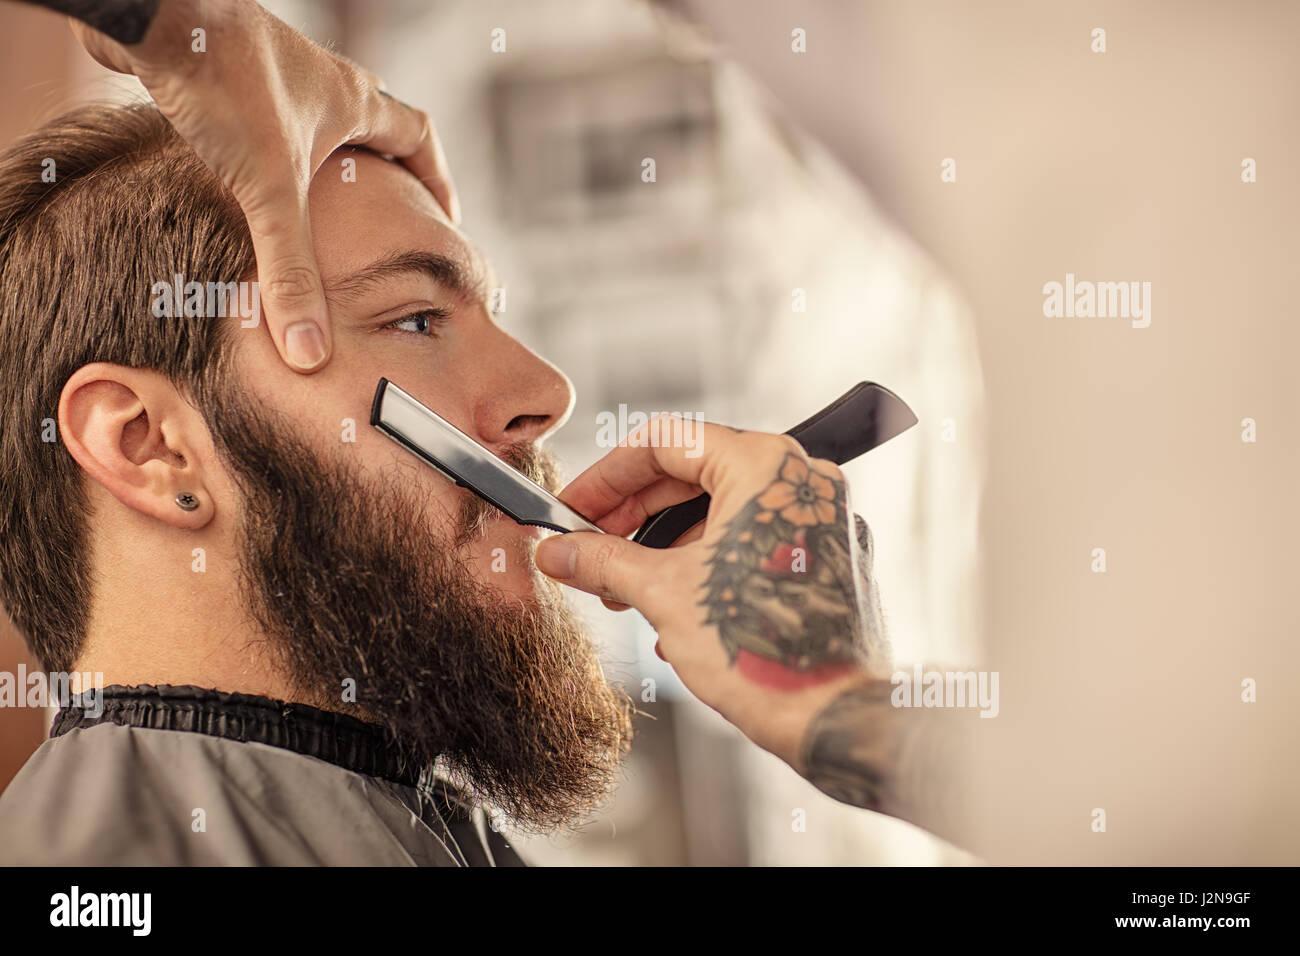 Barber with old-fashioned black razor shaving bearded man - Stock Image